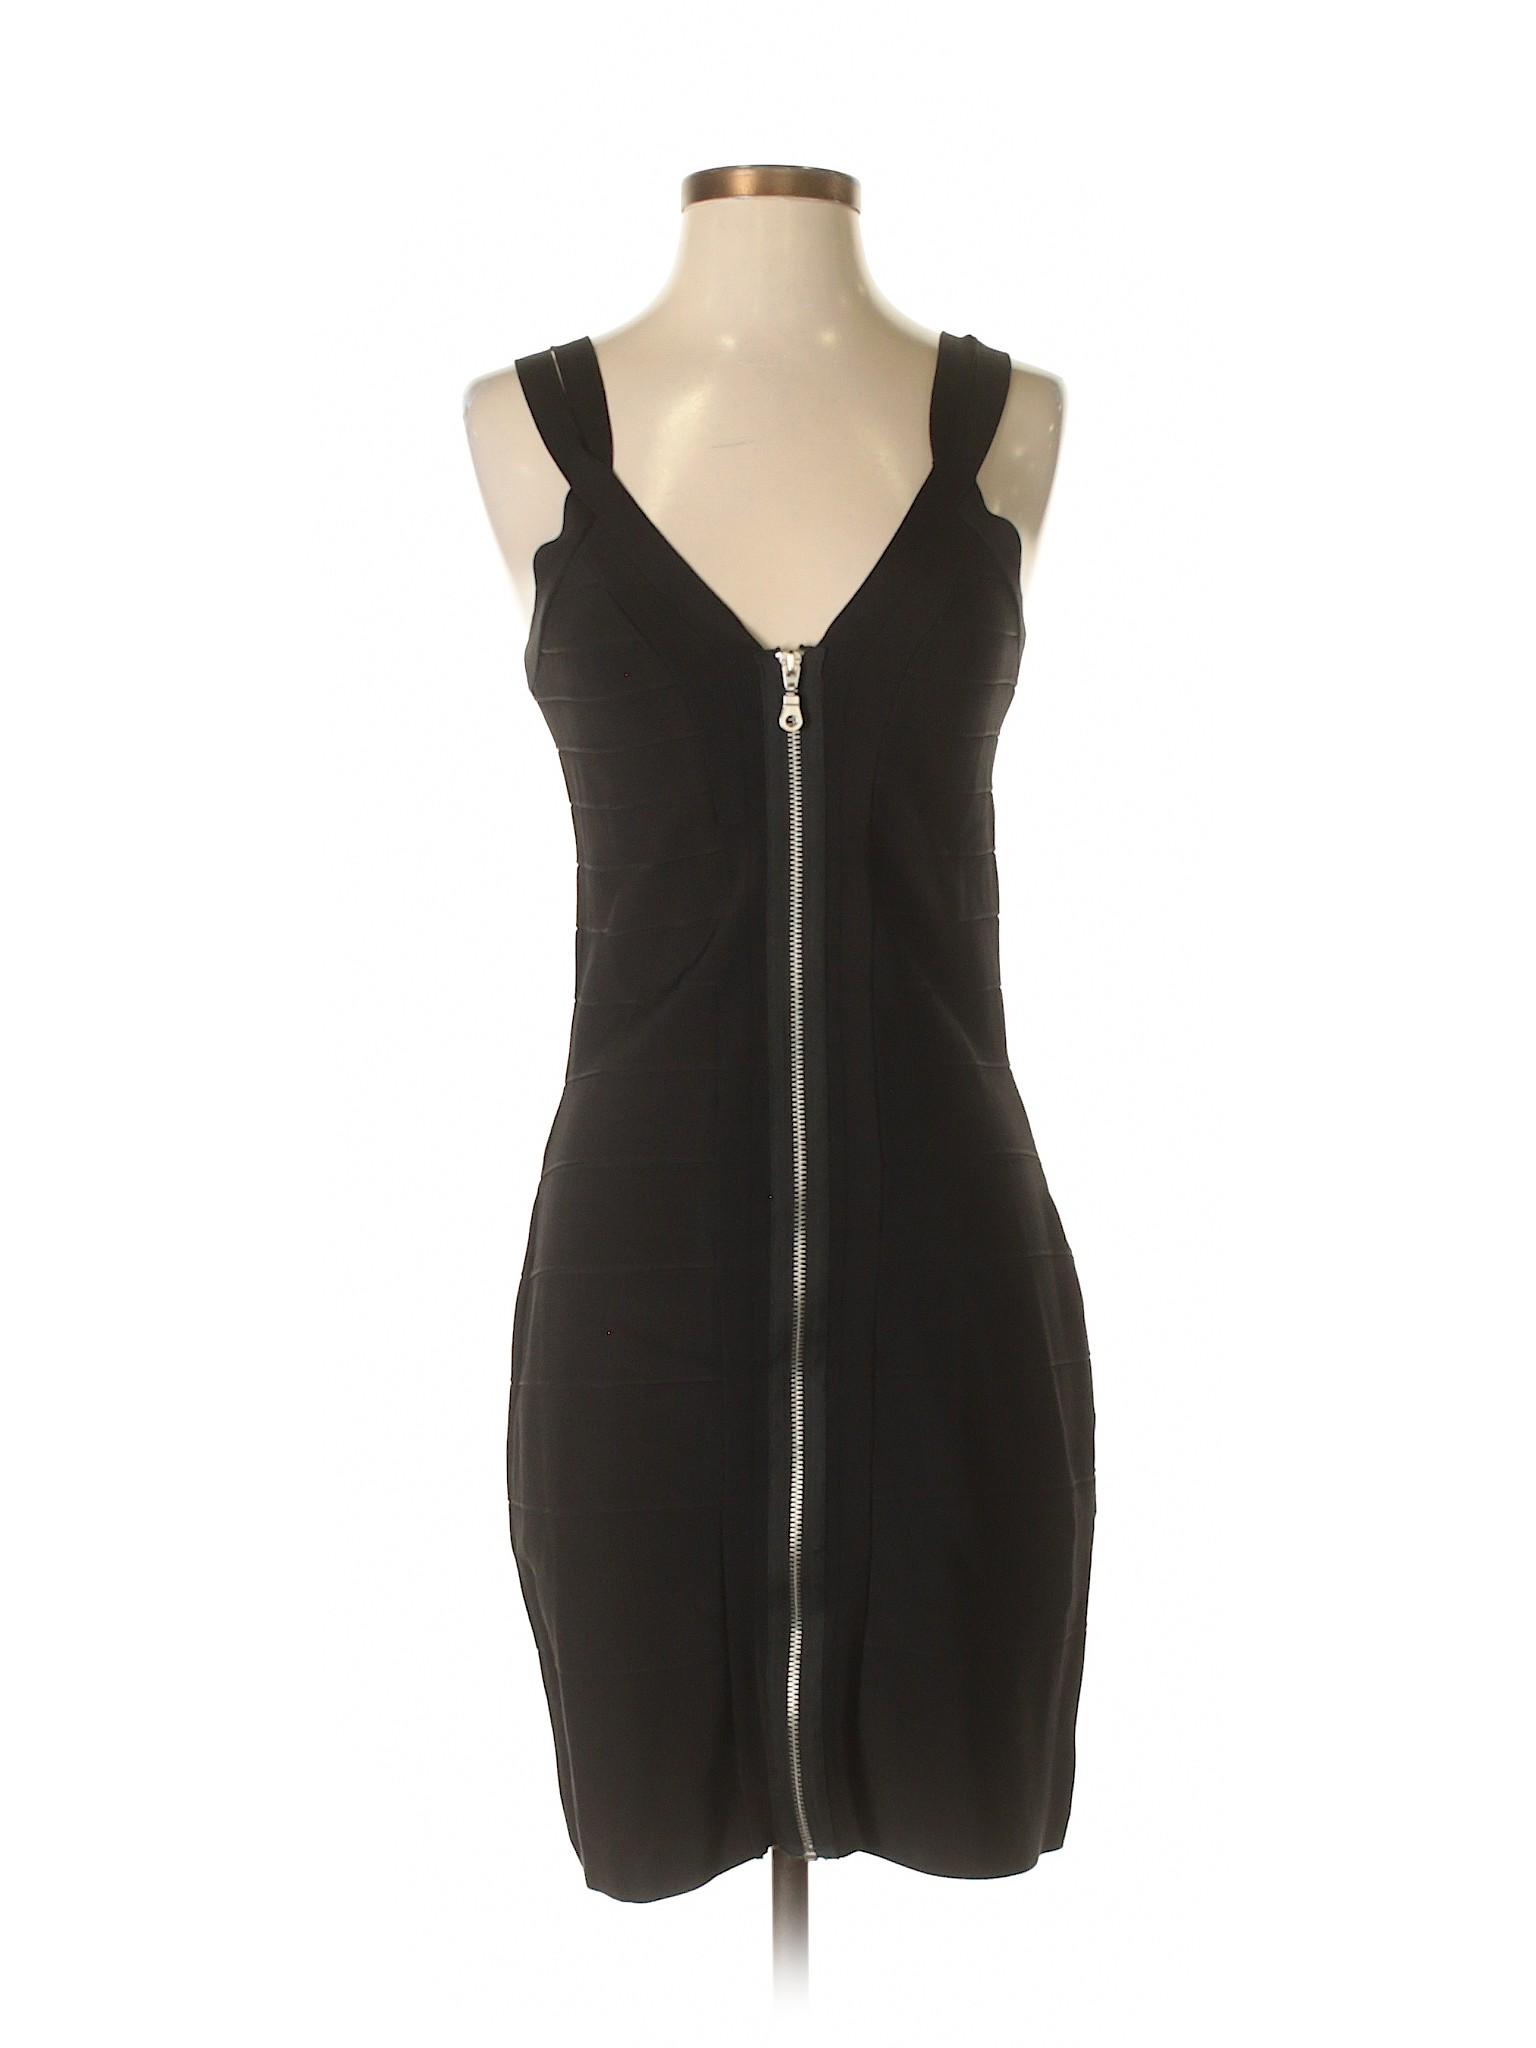 Concepts Casual Selling INC International Dress YqnAv